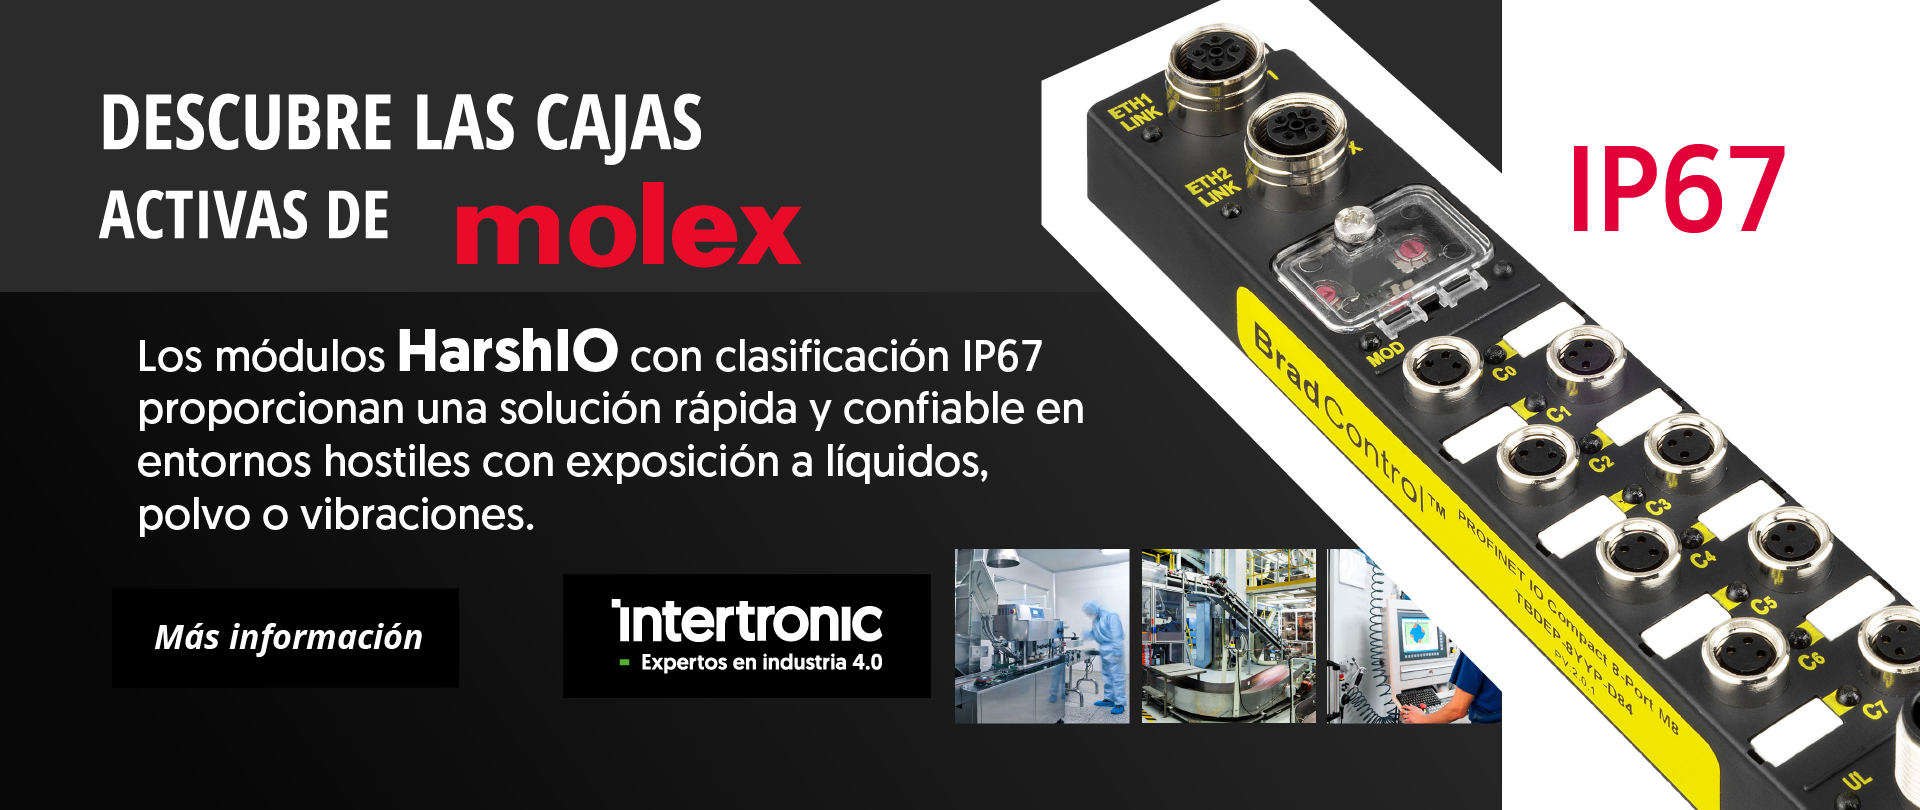 molex_cajas_activas_movil-2